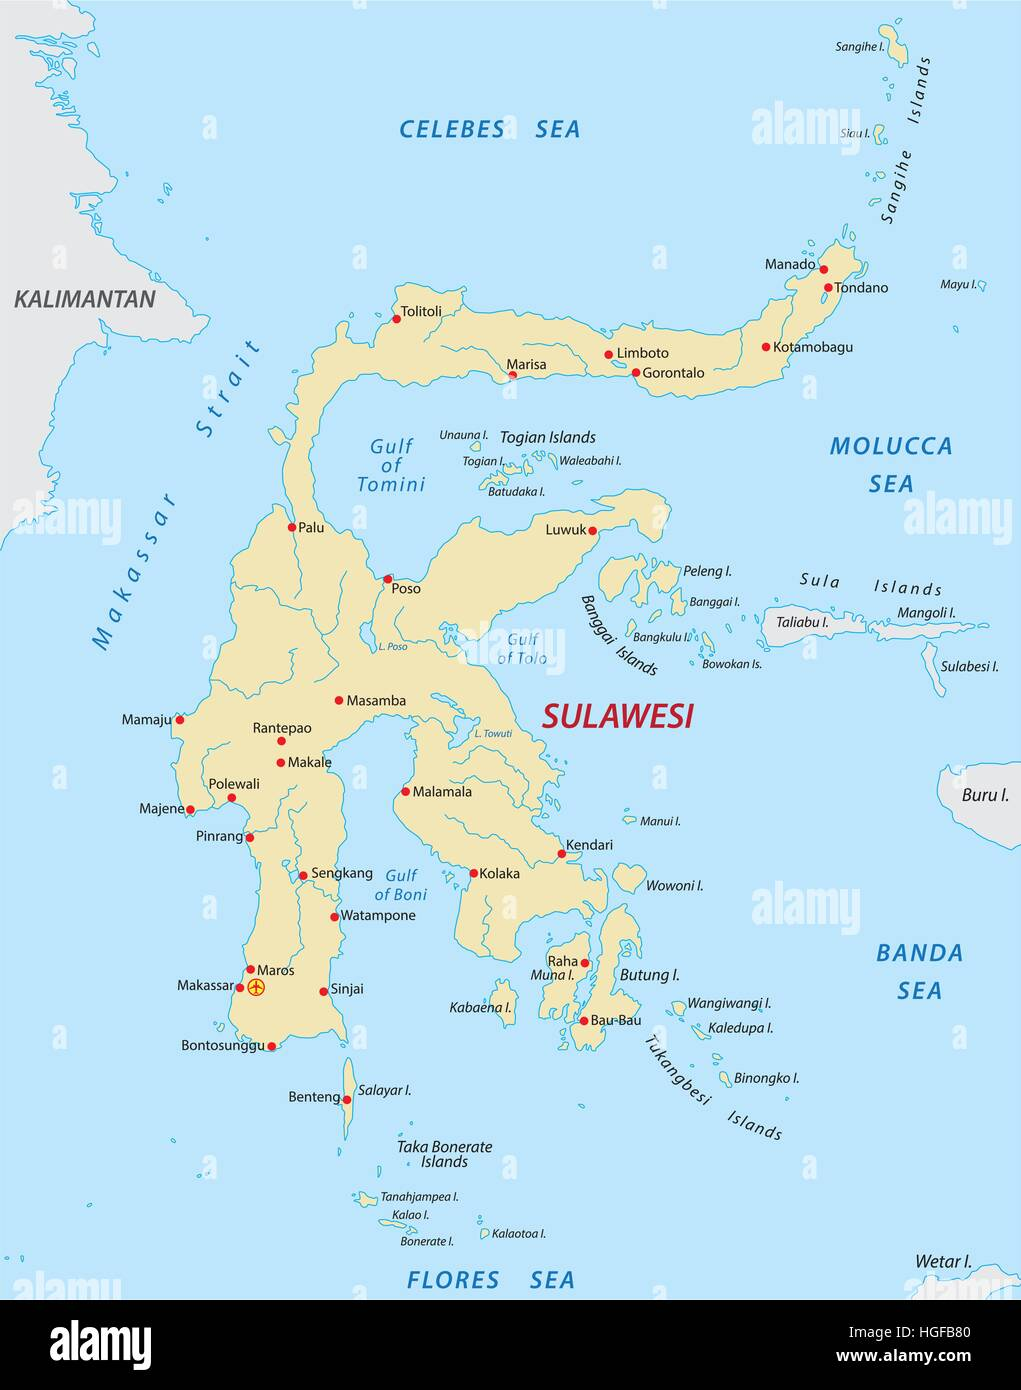 sulawesi map - Stock Vector